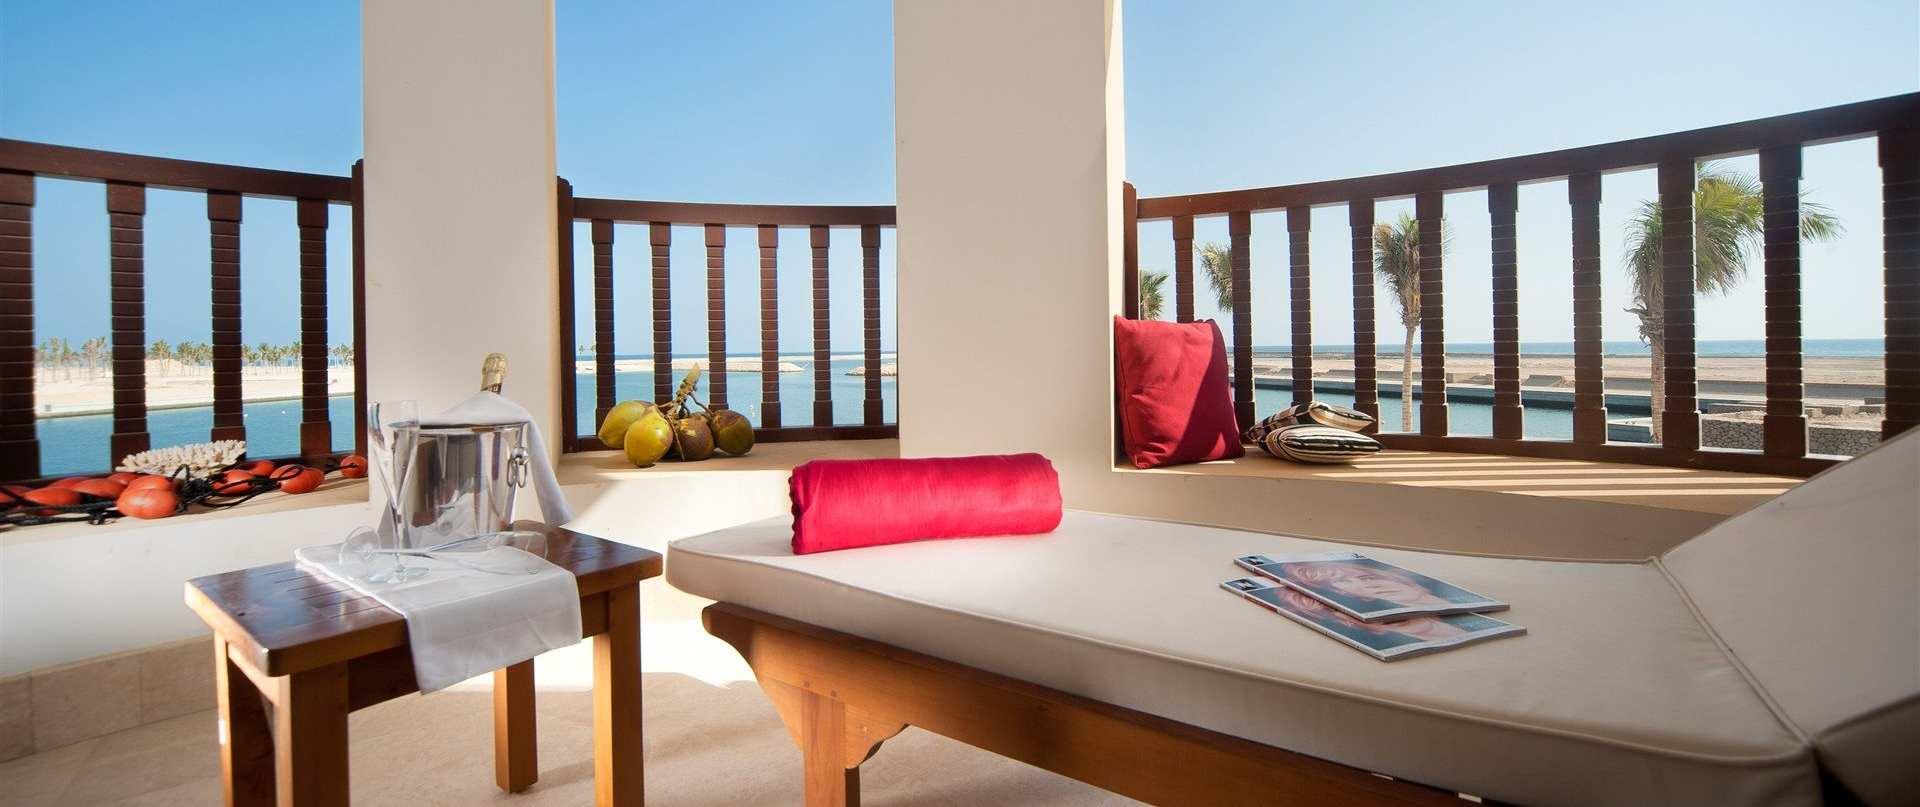 juweira-boutique-hotel-oman-marina-suite-terrace.jpg.1920x807_0_297_10000